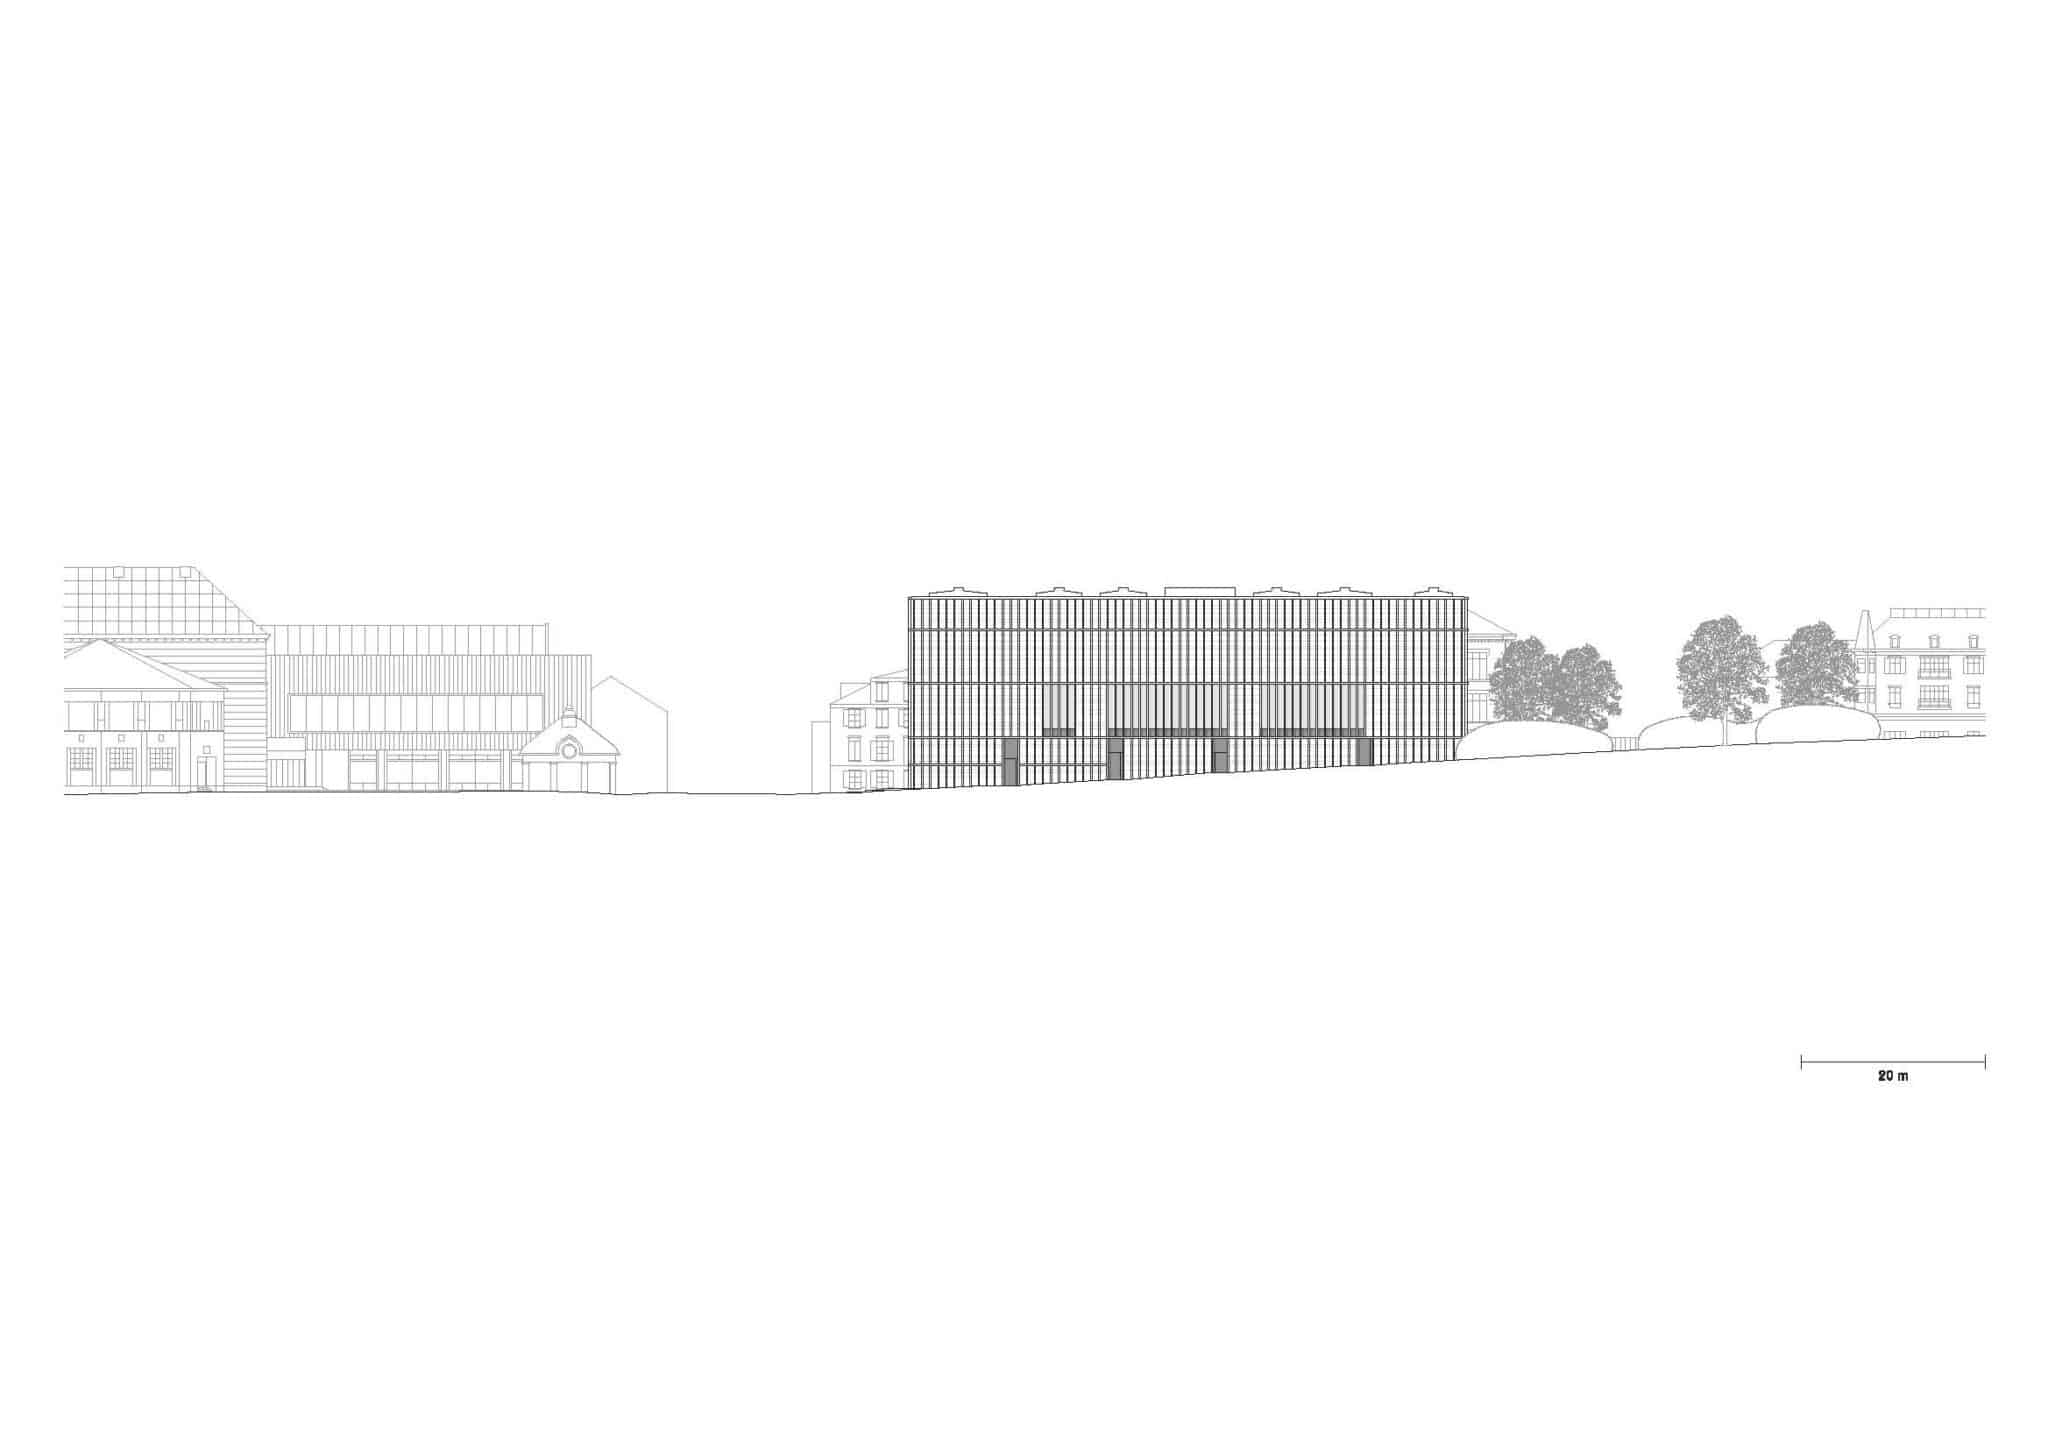 Kunsthaus Zürich  - 20210712 Chipperfield Kunsthaus 12.2.1 59